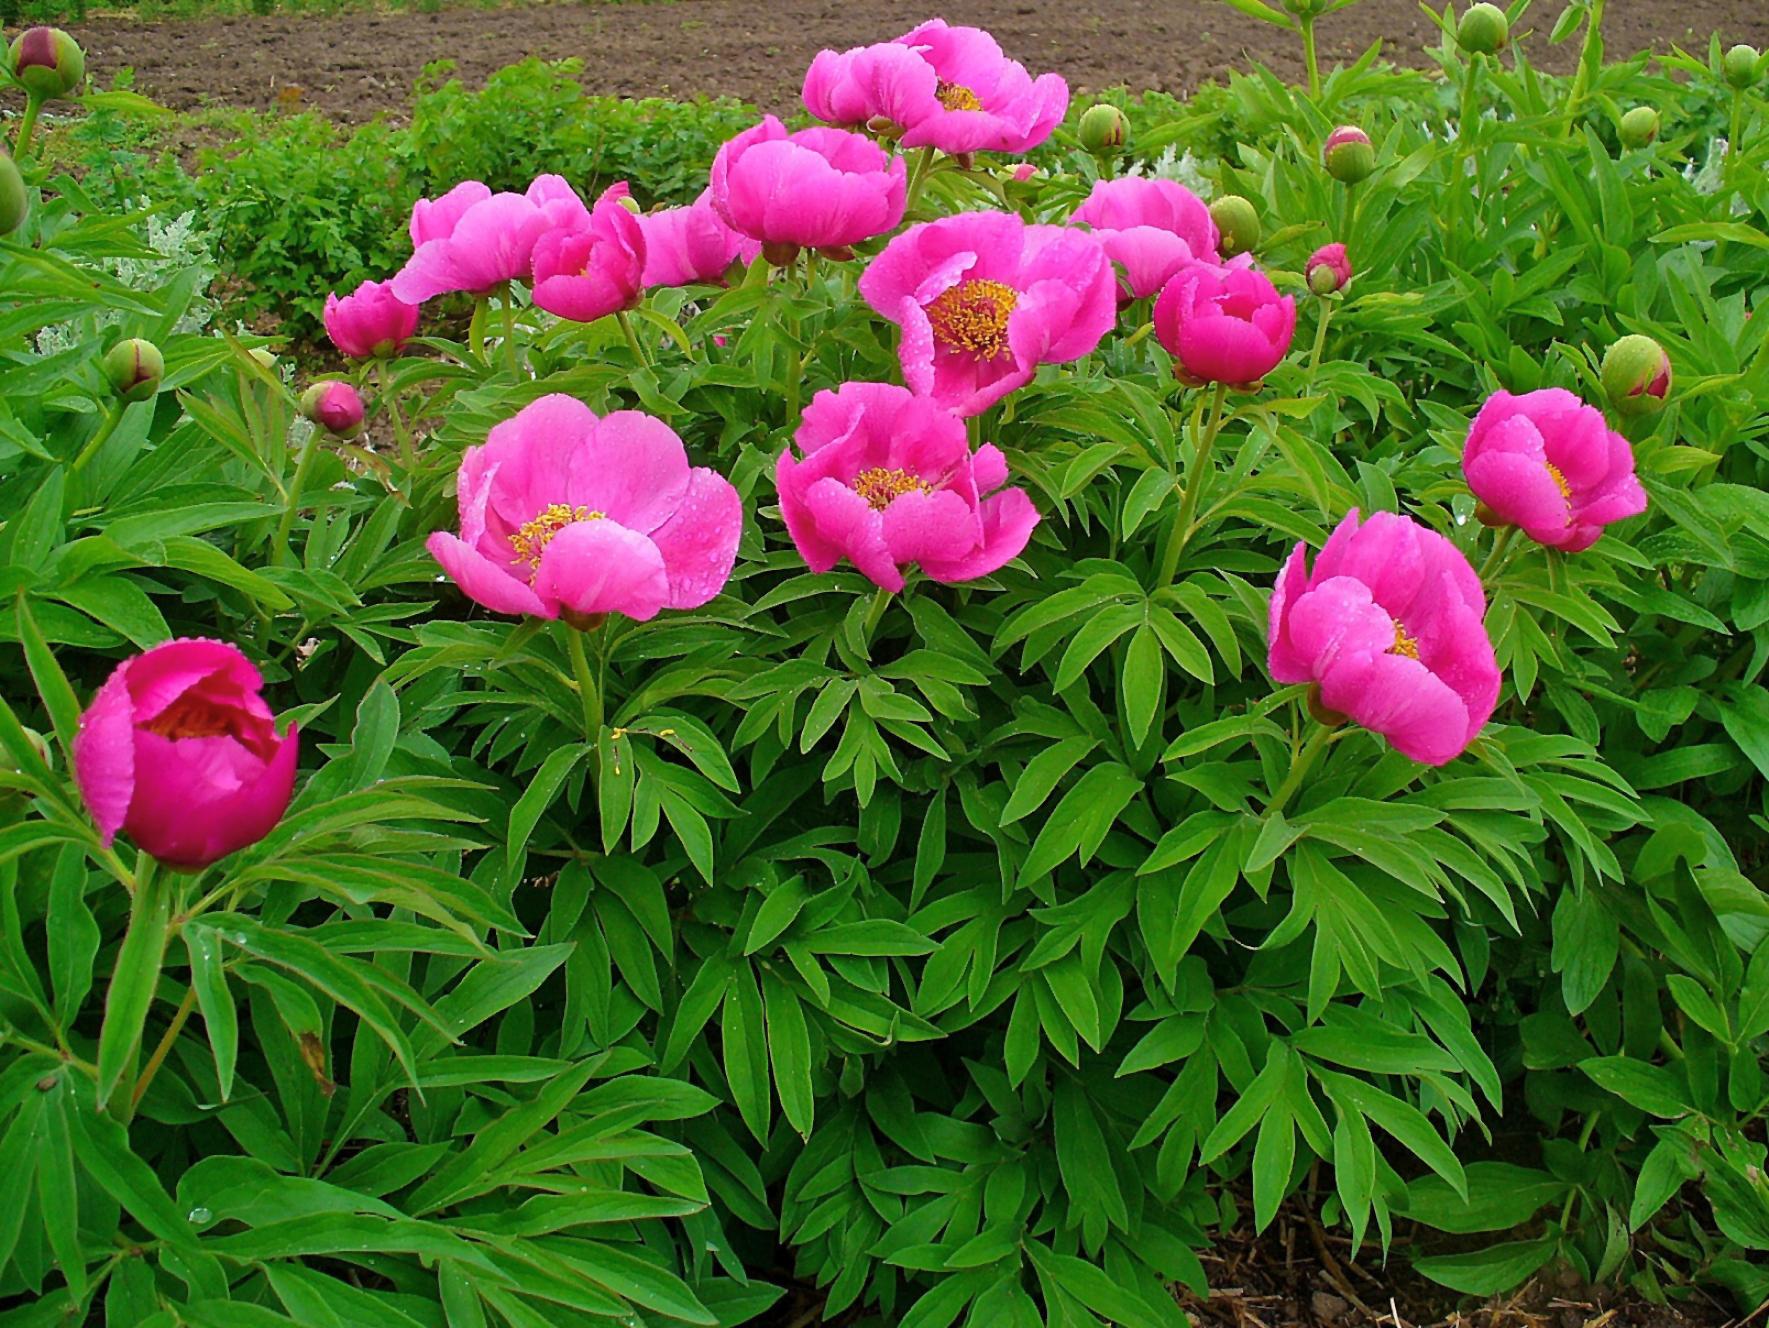 file paeonia officinalis 001 jpg wikimedia commons